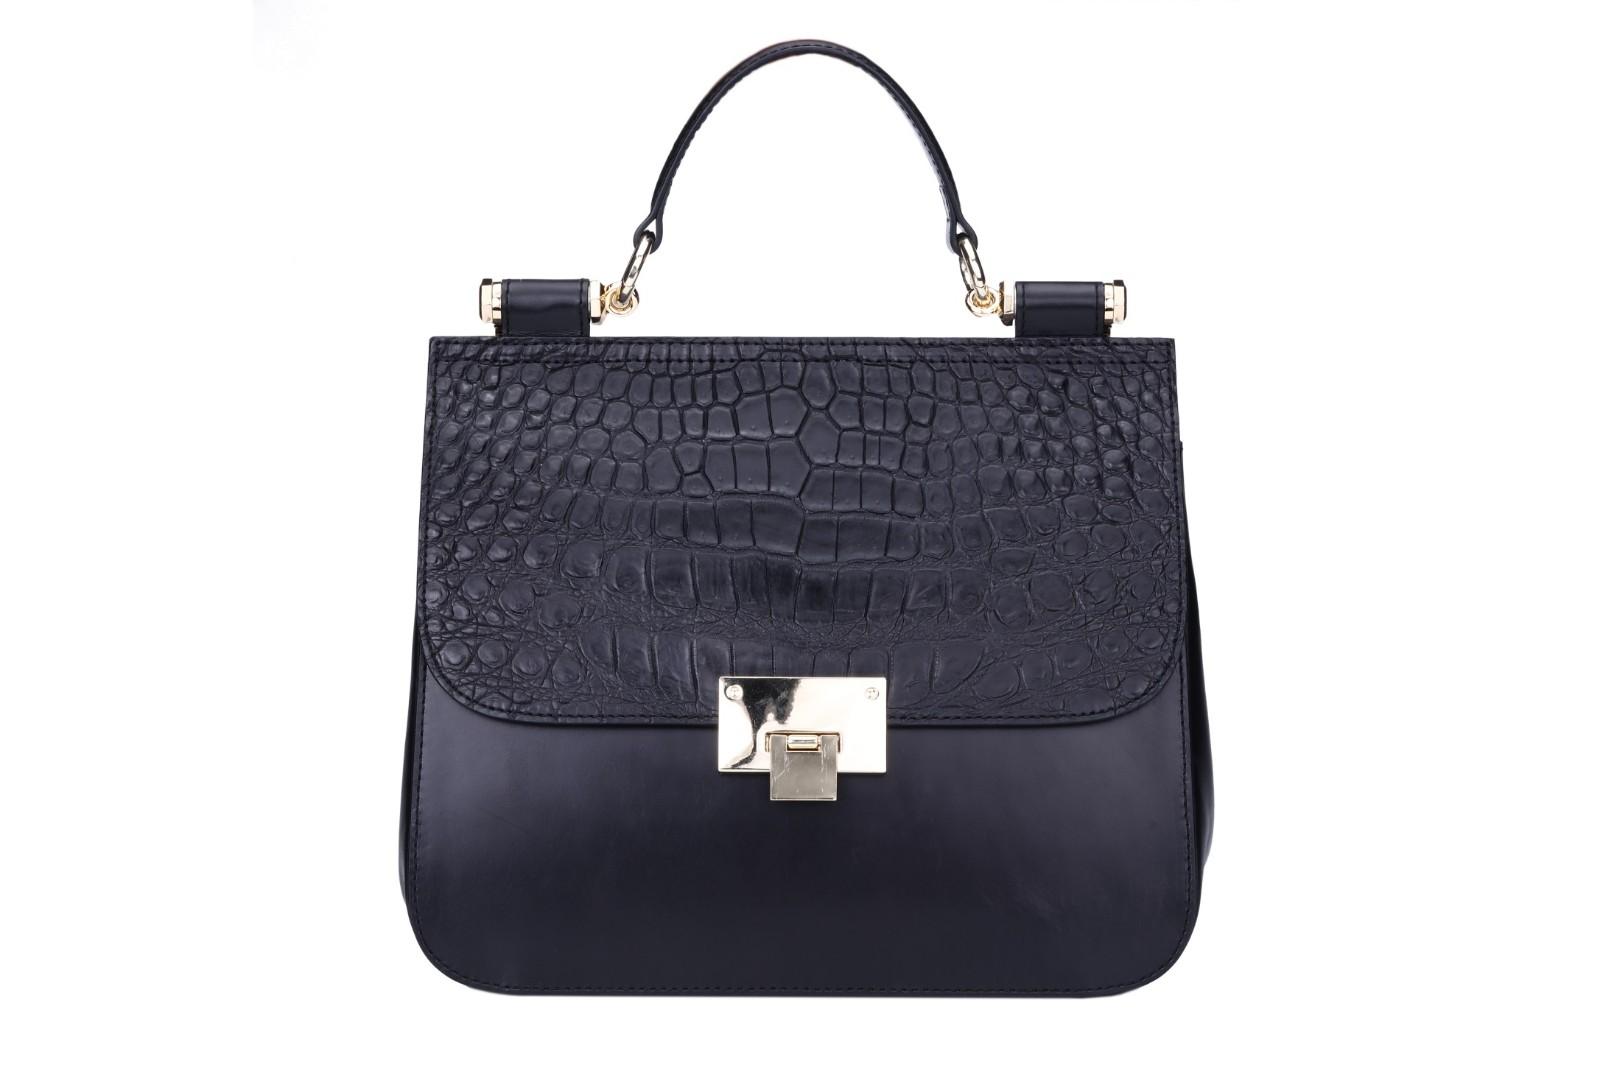 GF bags-Professional Ladies Bag Affordable Handbags From Gaofeng Bags